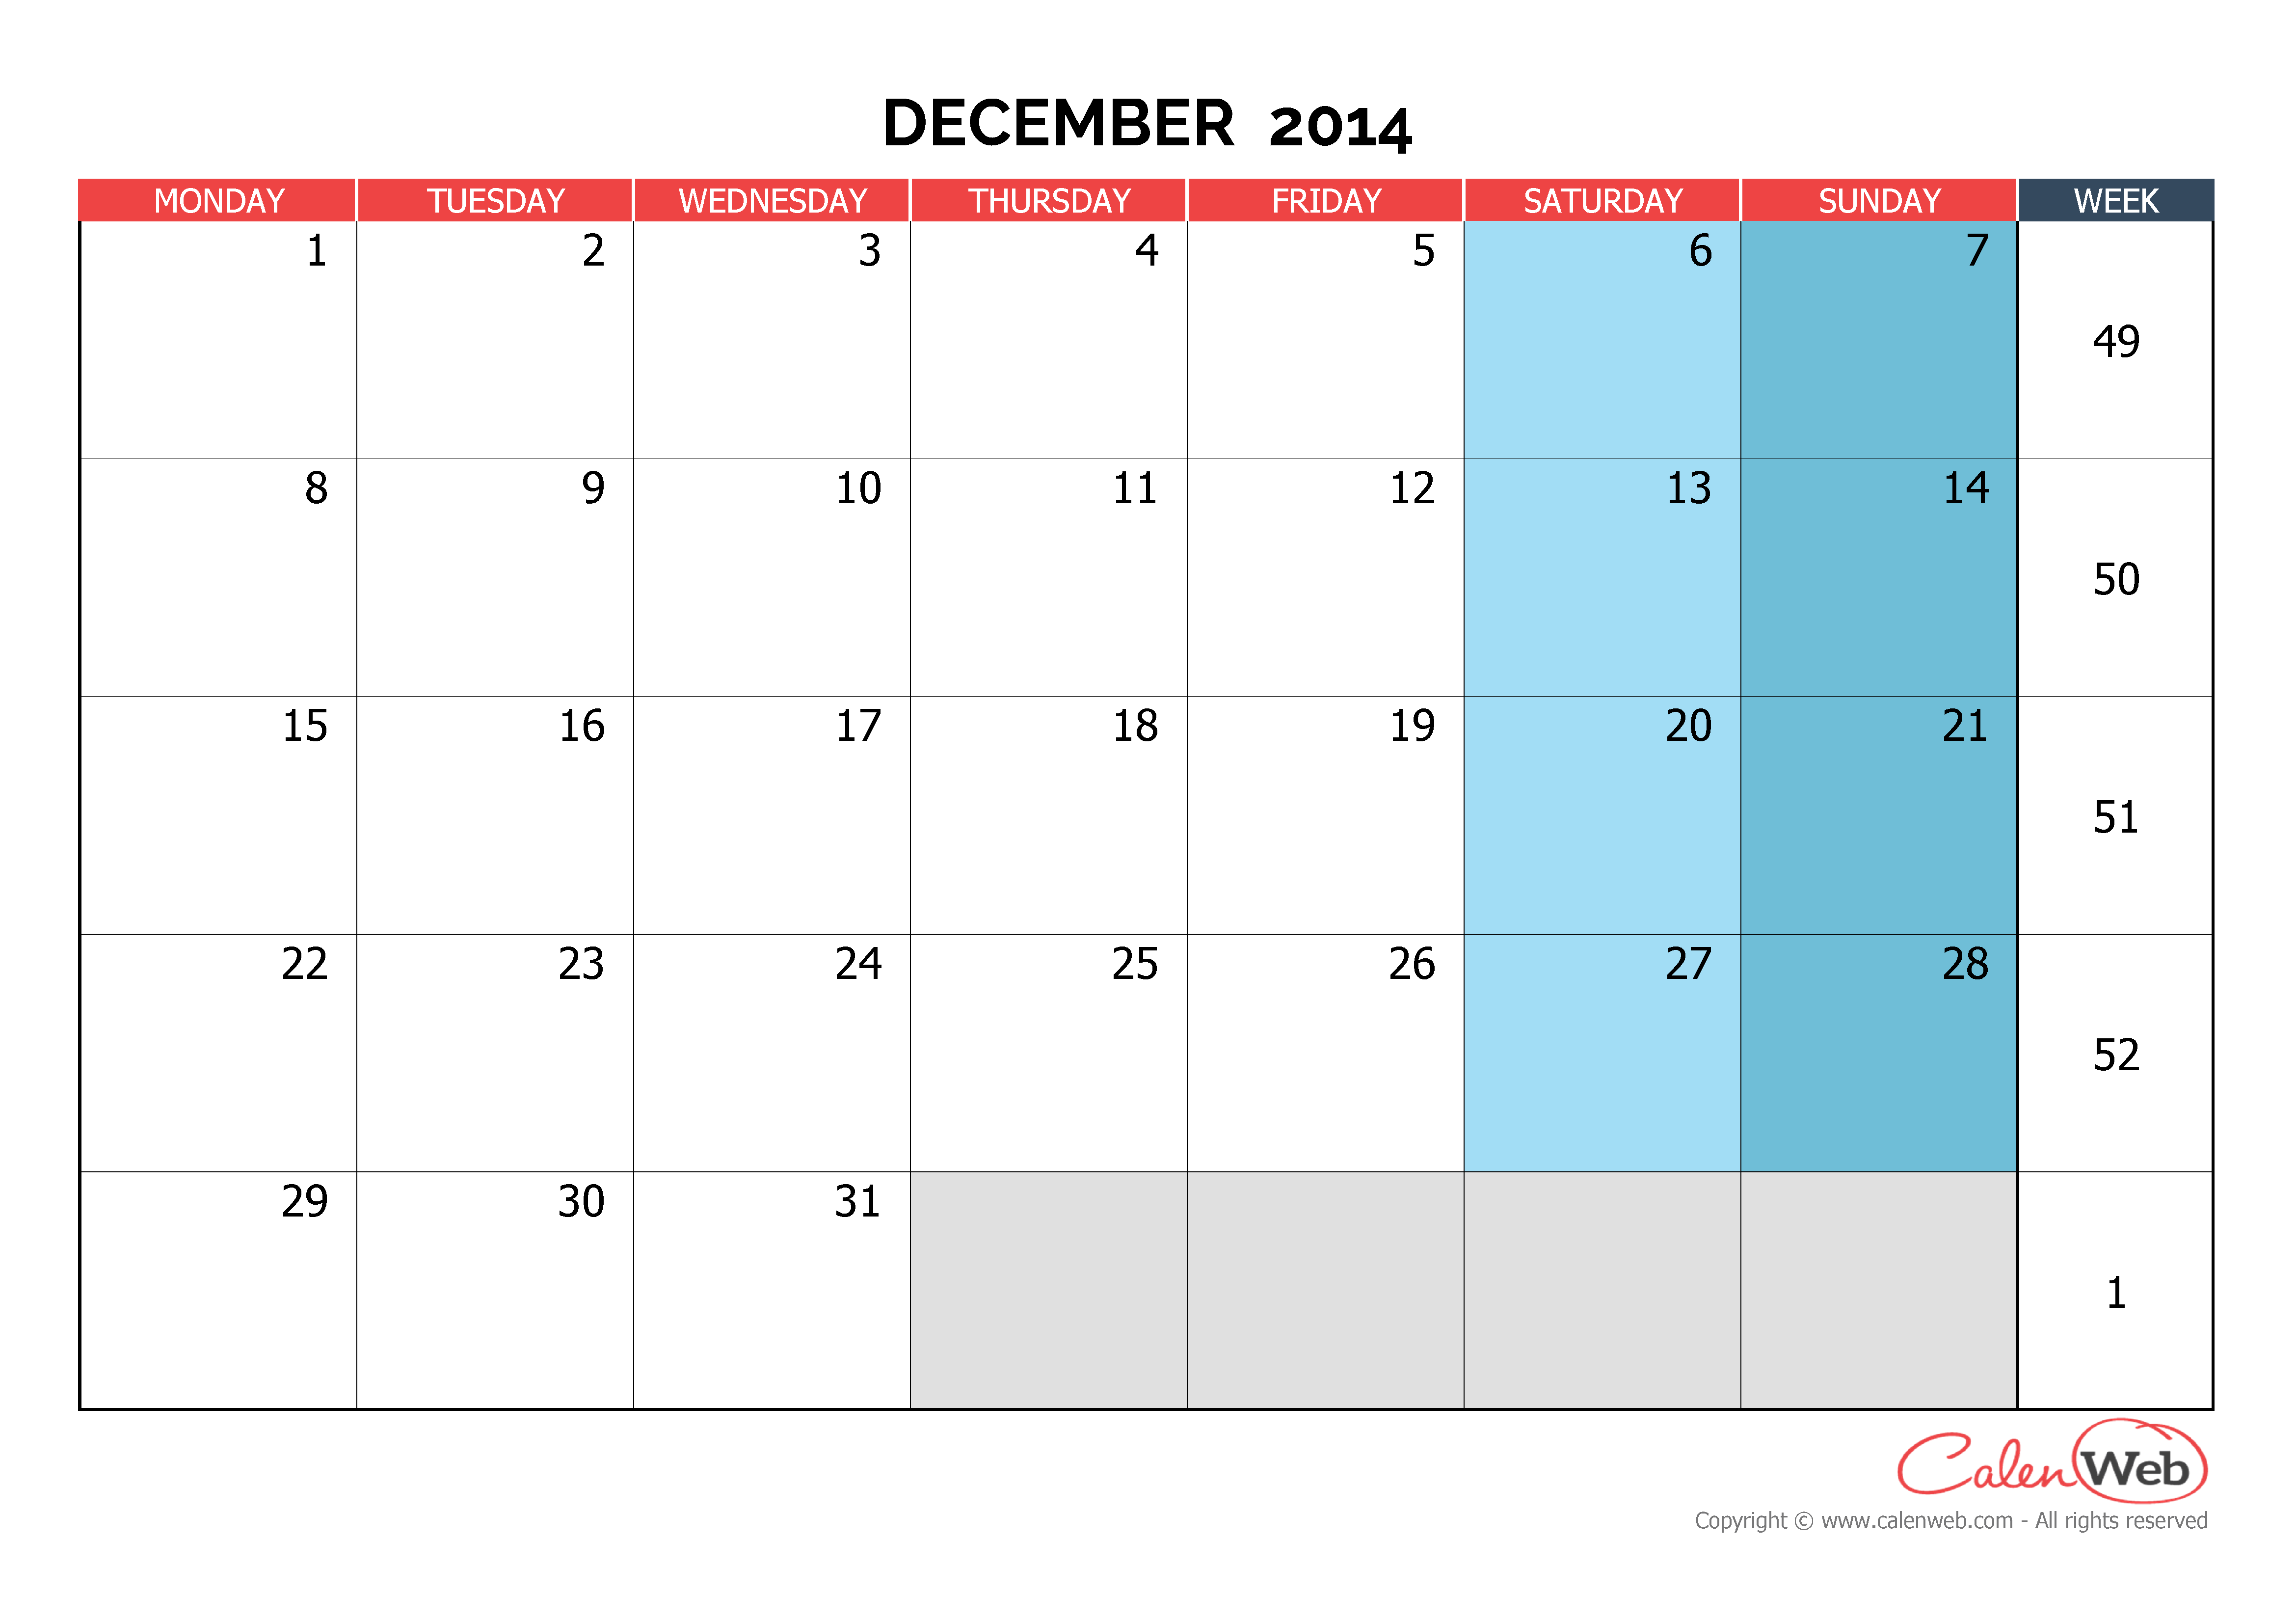 December Calendar 2014 : Monthly calendar month of december the week starts